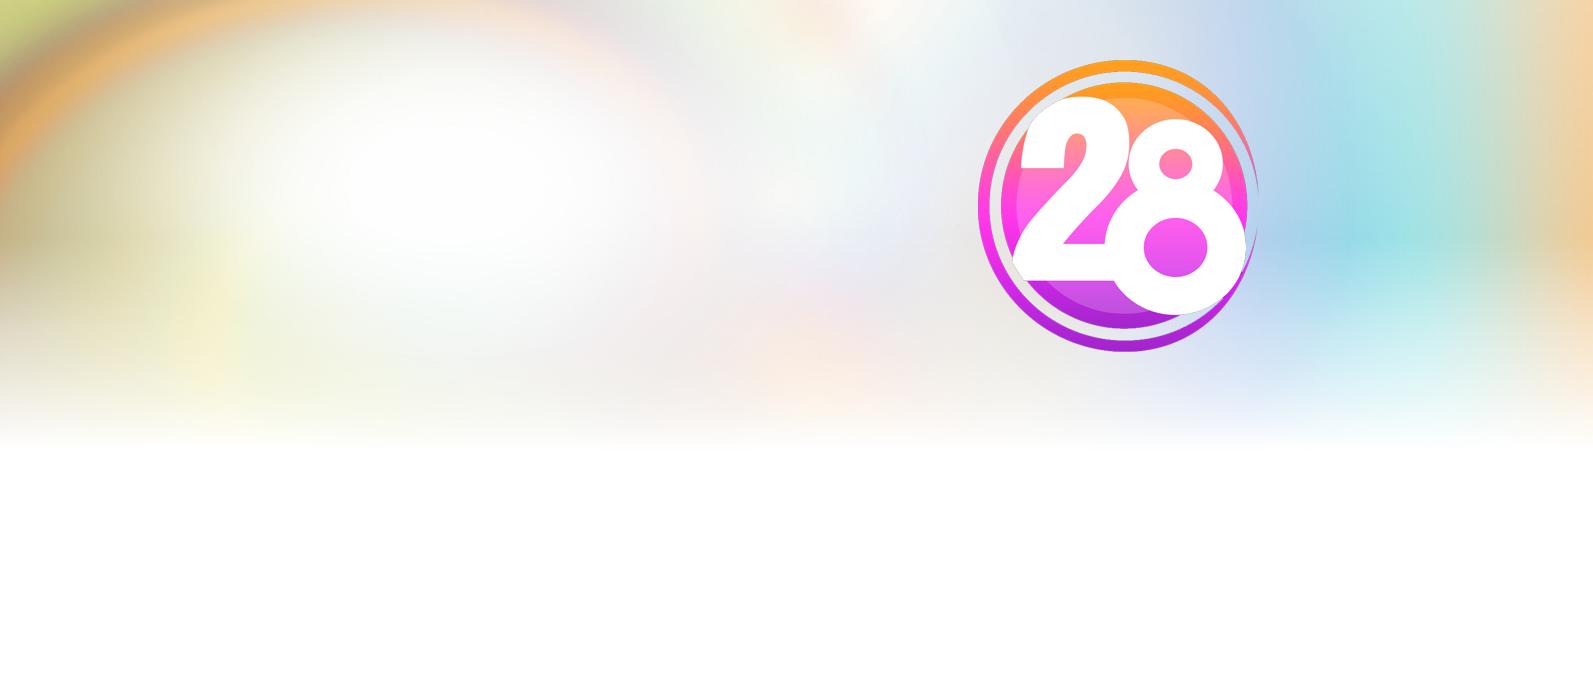 fondo canal 28